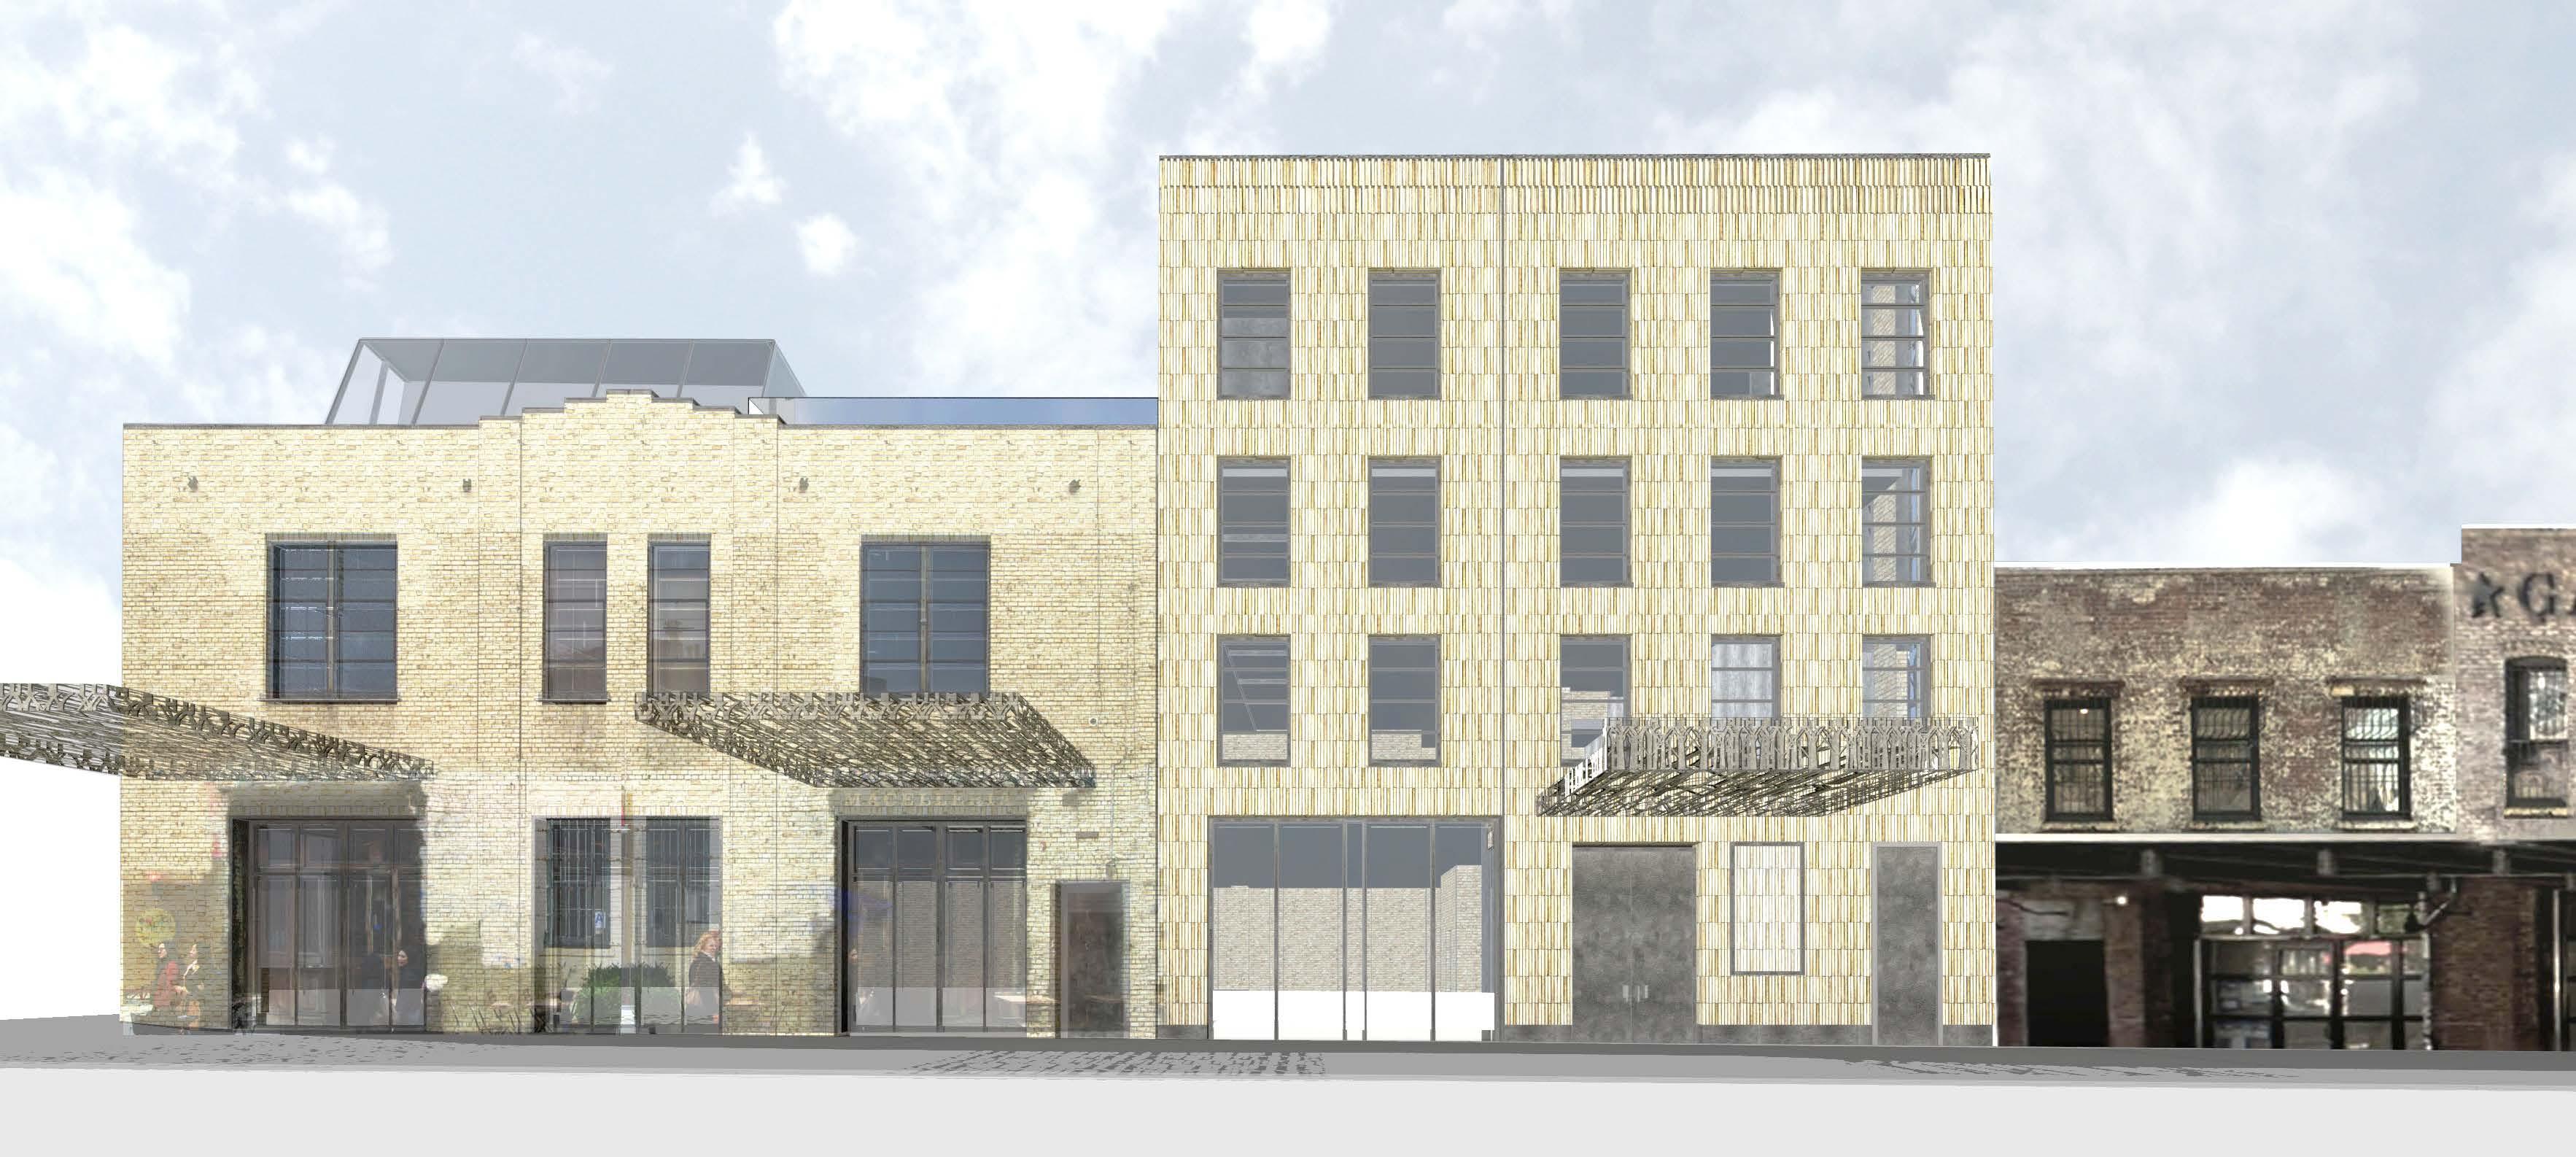 46-50 Gansevoort Street, rendering by BKSK Architects